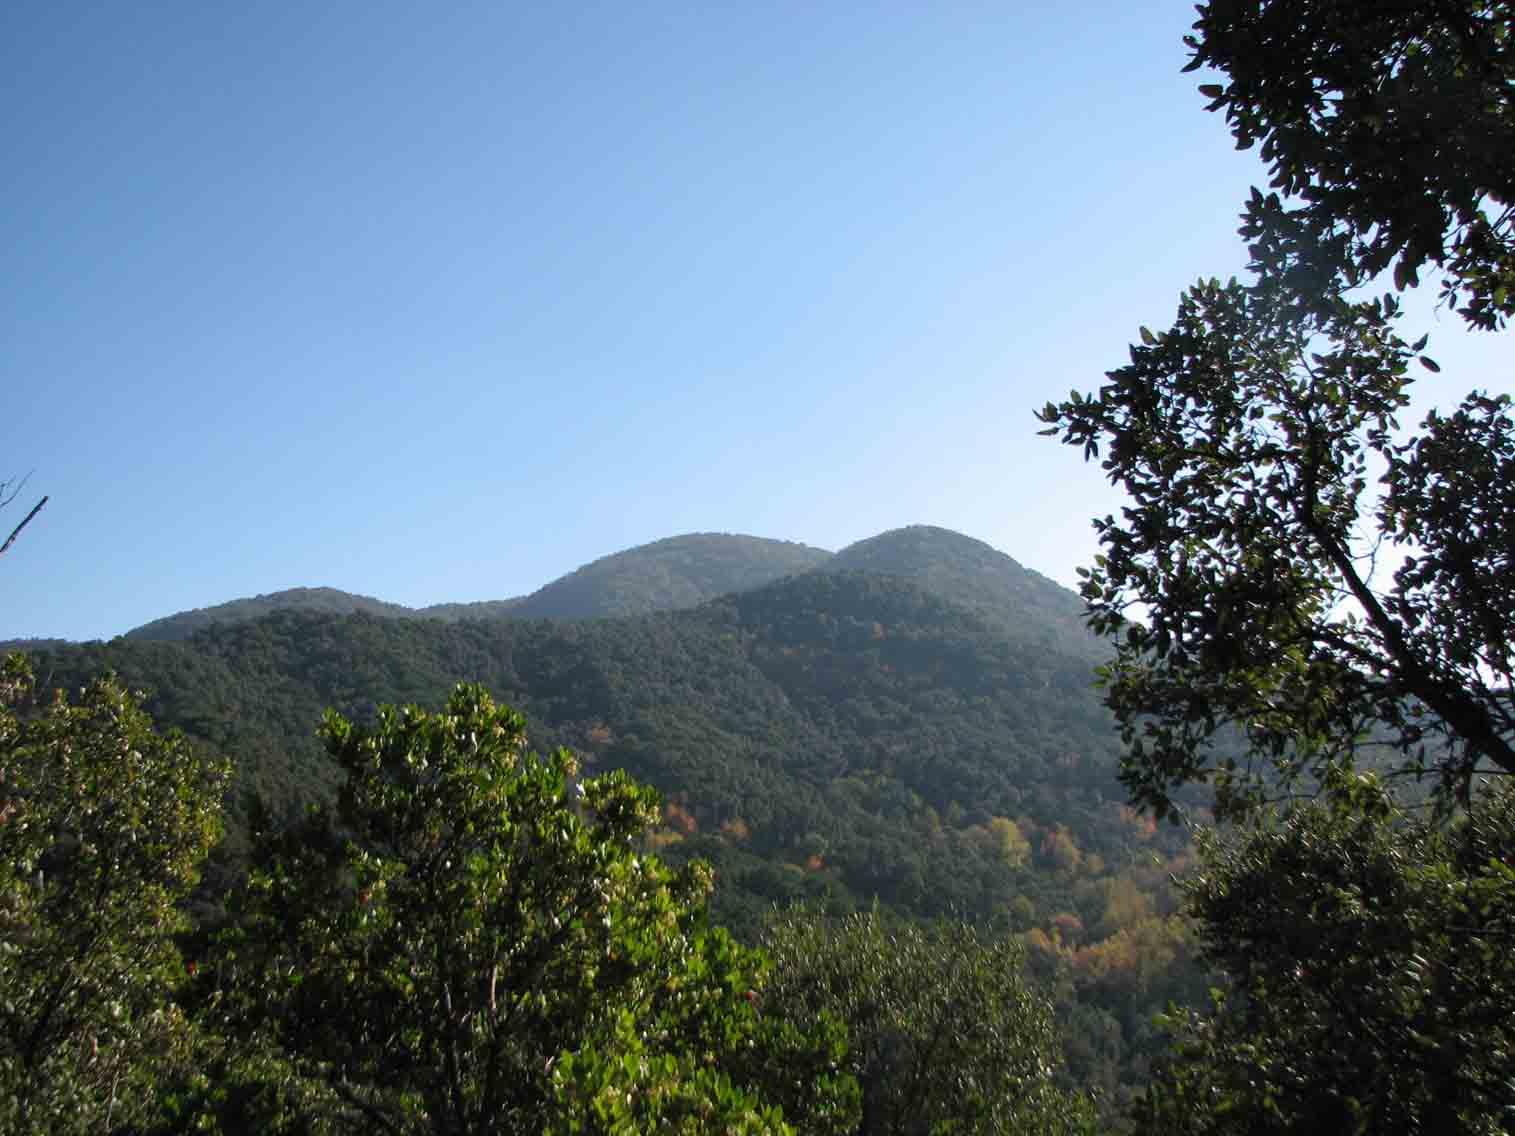 El Parque del Montnegre i el Corredor